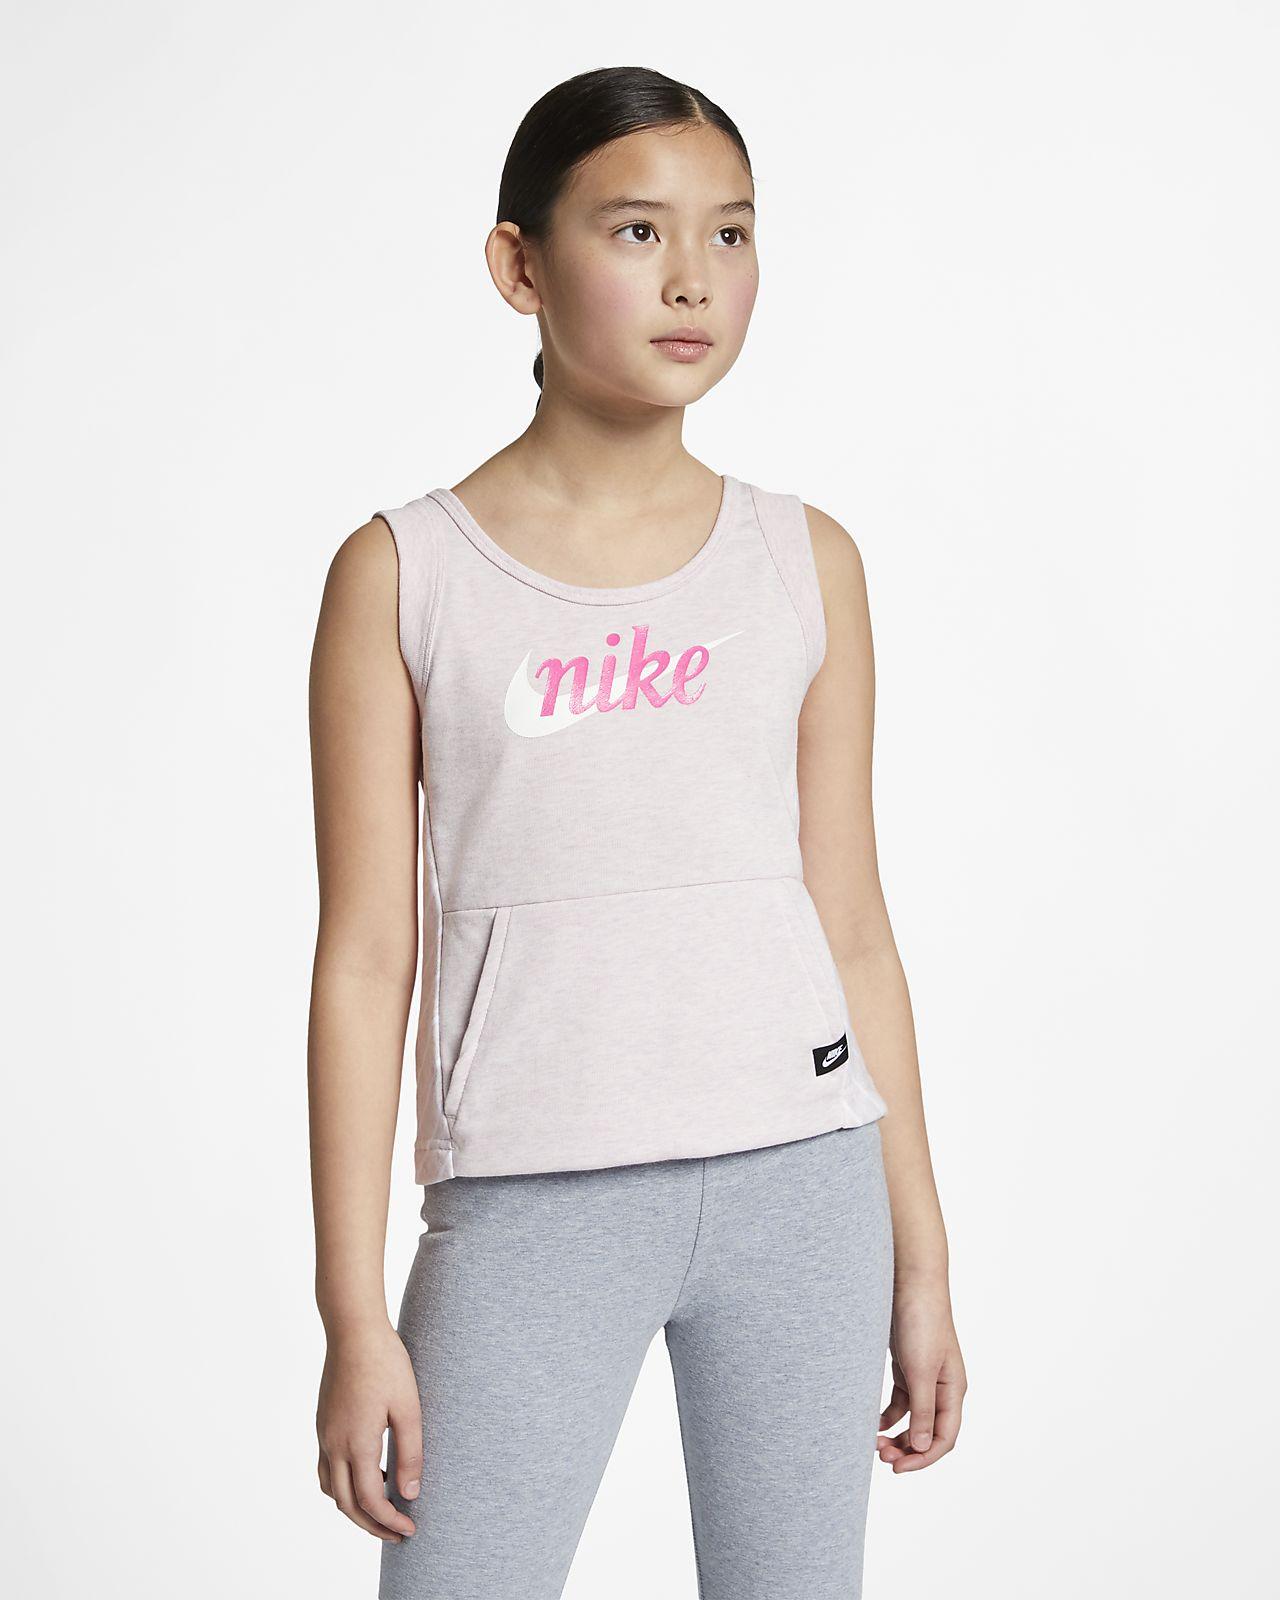 Nike Sportswear 大童(女孩)背心